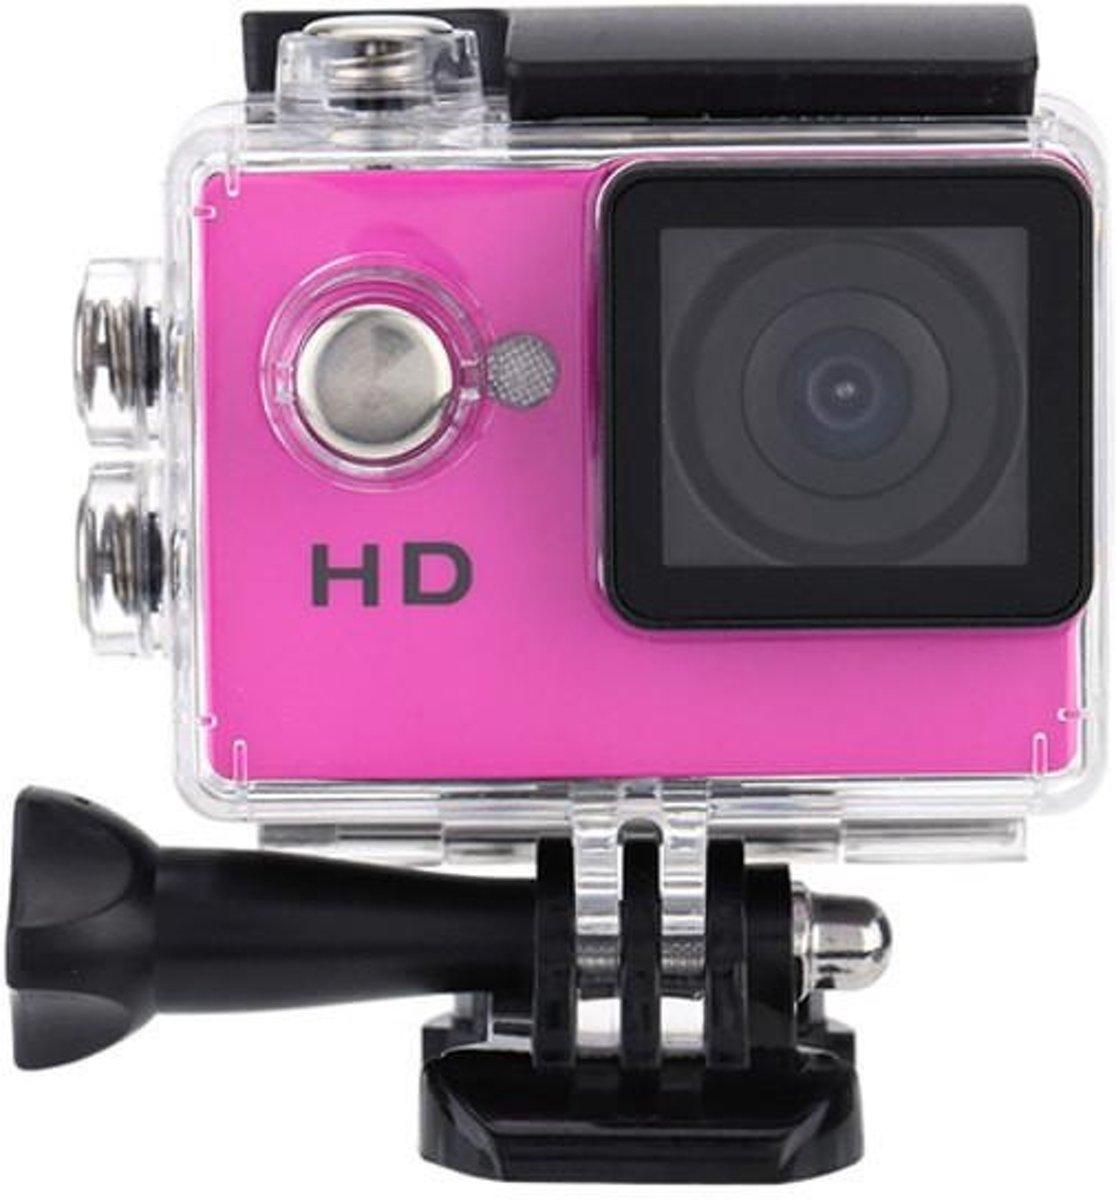 4K Full HD Sport Actie Camera   Action Sports Cam 1080p   2 inch LCD scherm   Onderwater Camera   Waterdicht tot 30 meter   Extreme Sport Camera inclusief accessoires   kleur Roze